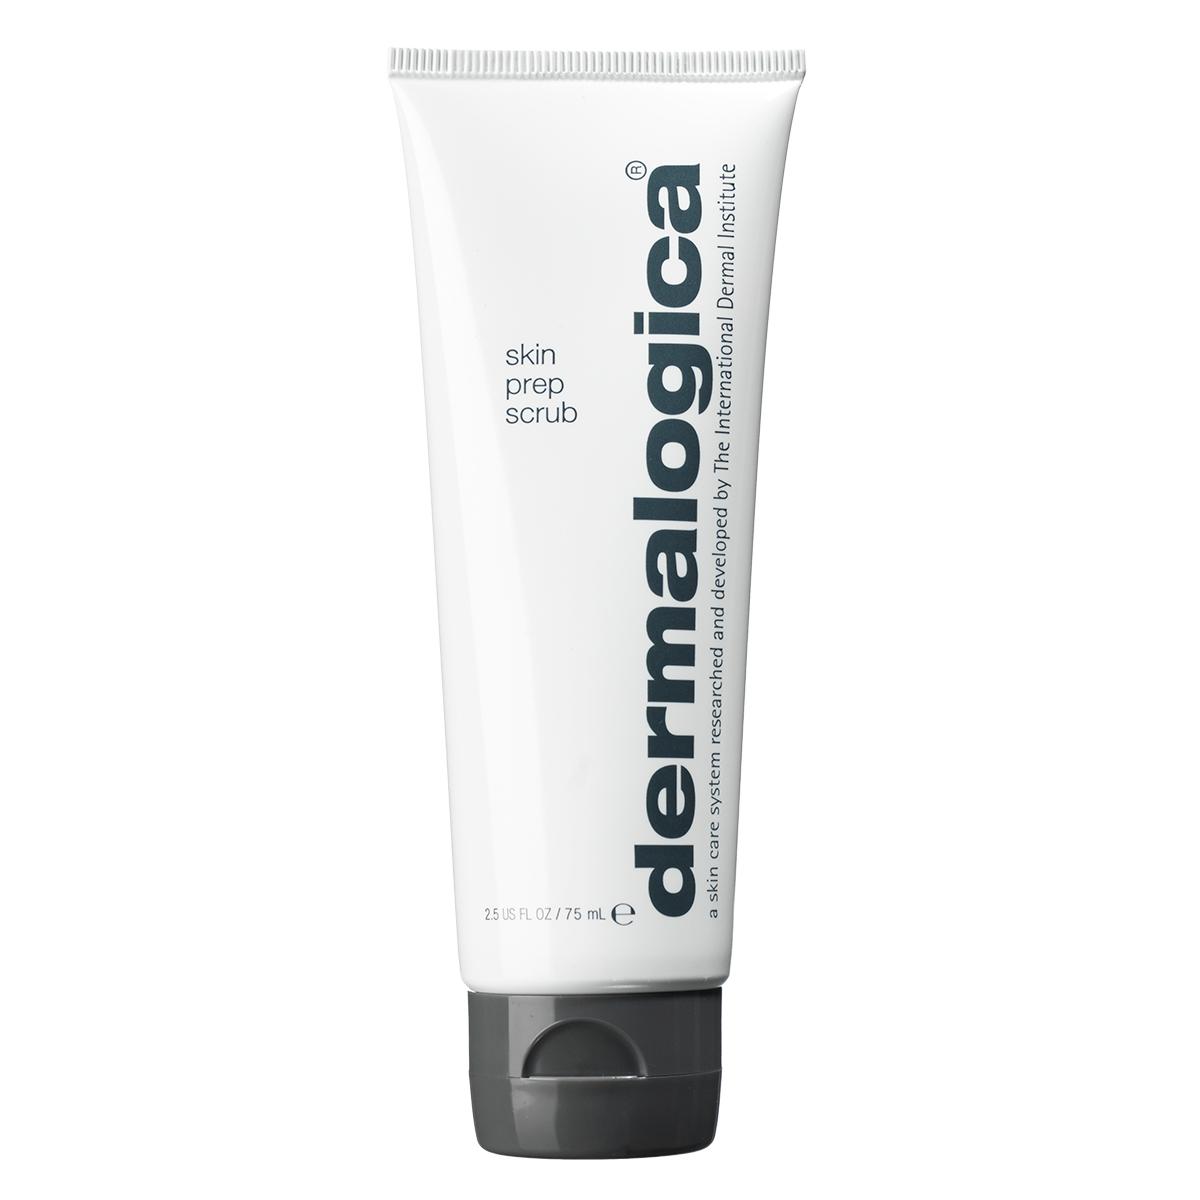 Billede af Dermalogica Skin Prep Scrub - 75 ml